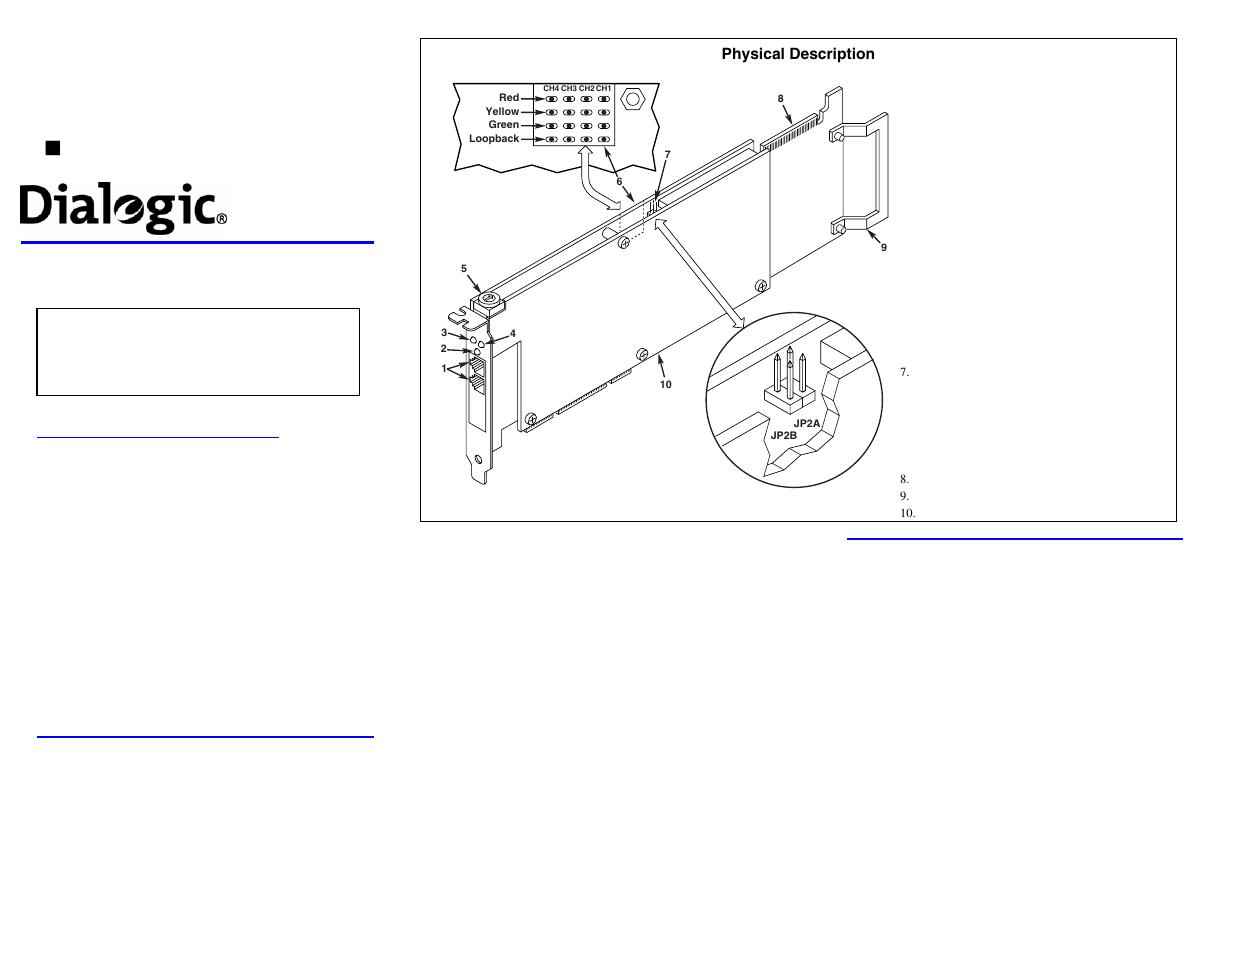 dialogic dm3 media boards dmv600btep user manual 2 pages rh manualsdir com Dialogic Reading Dialogic Software